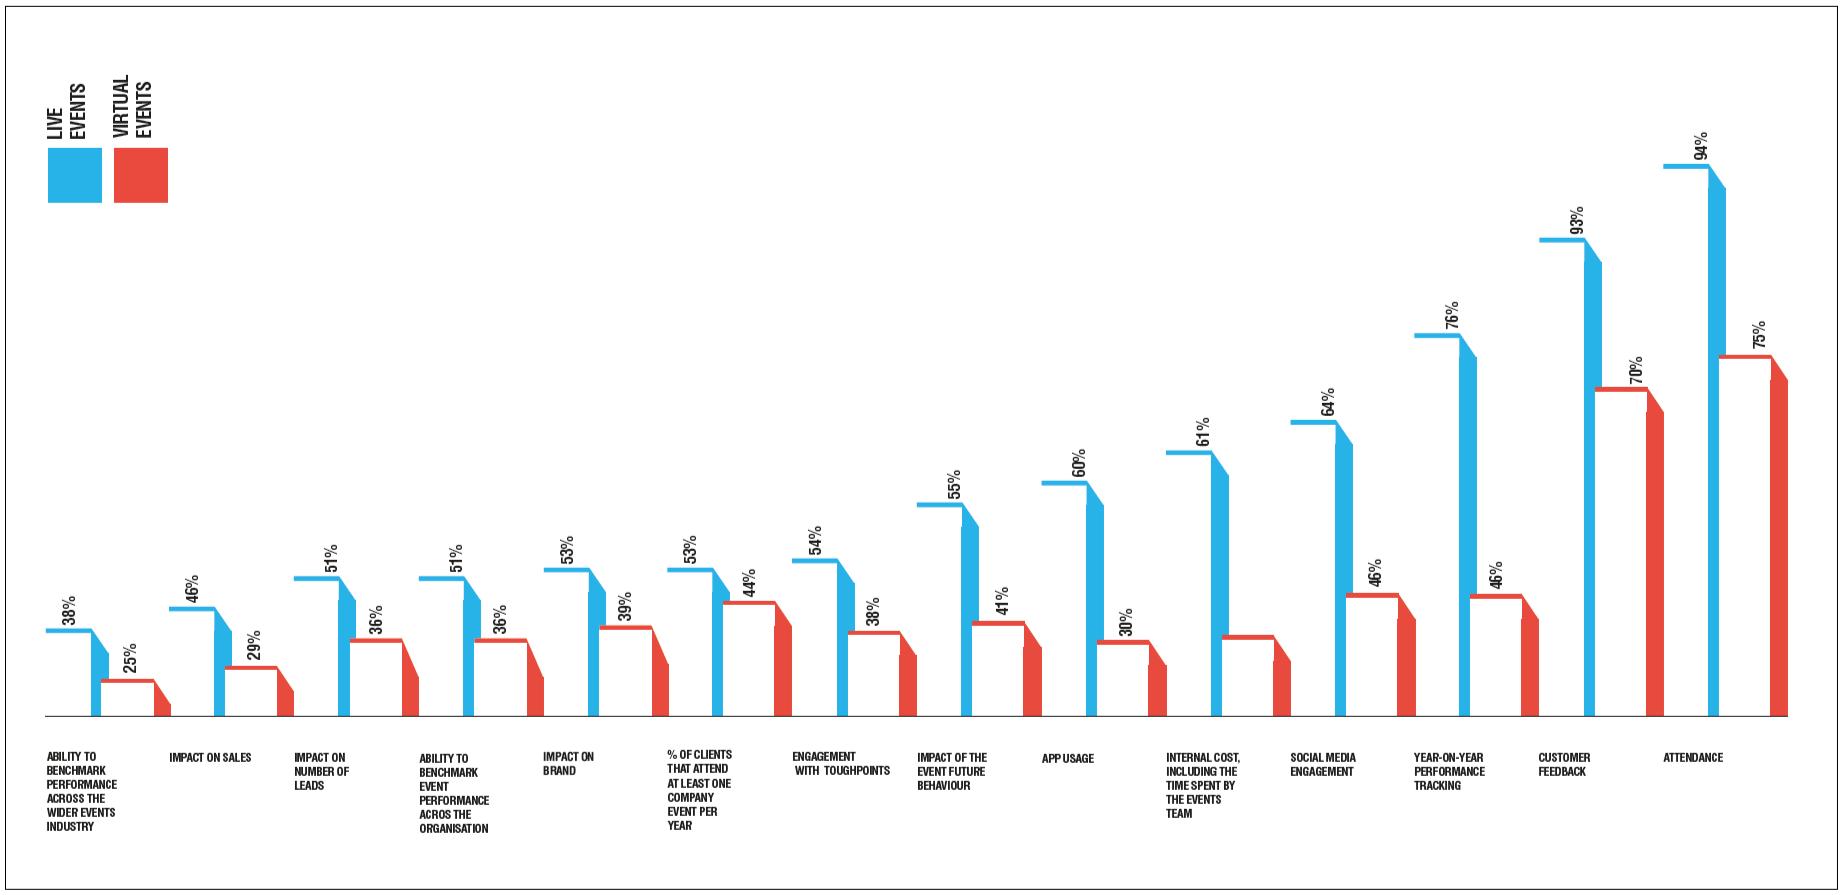 ice report 2020 - metrics chart